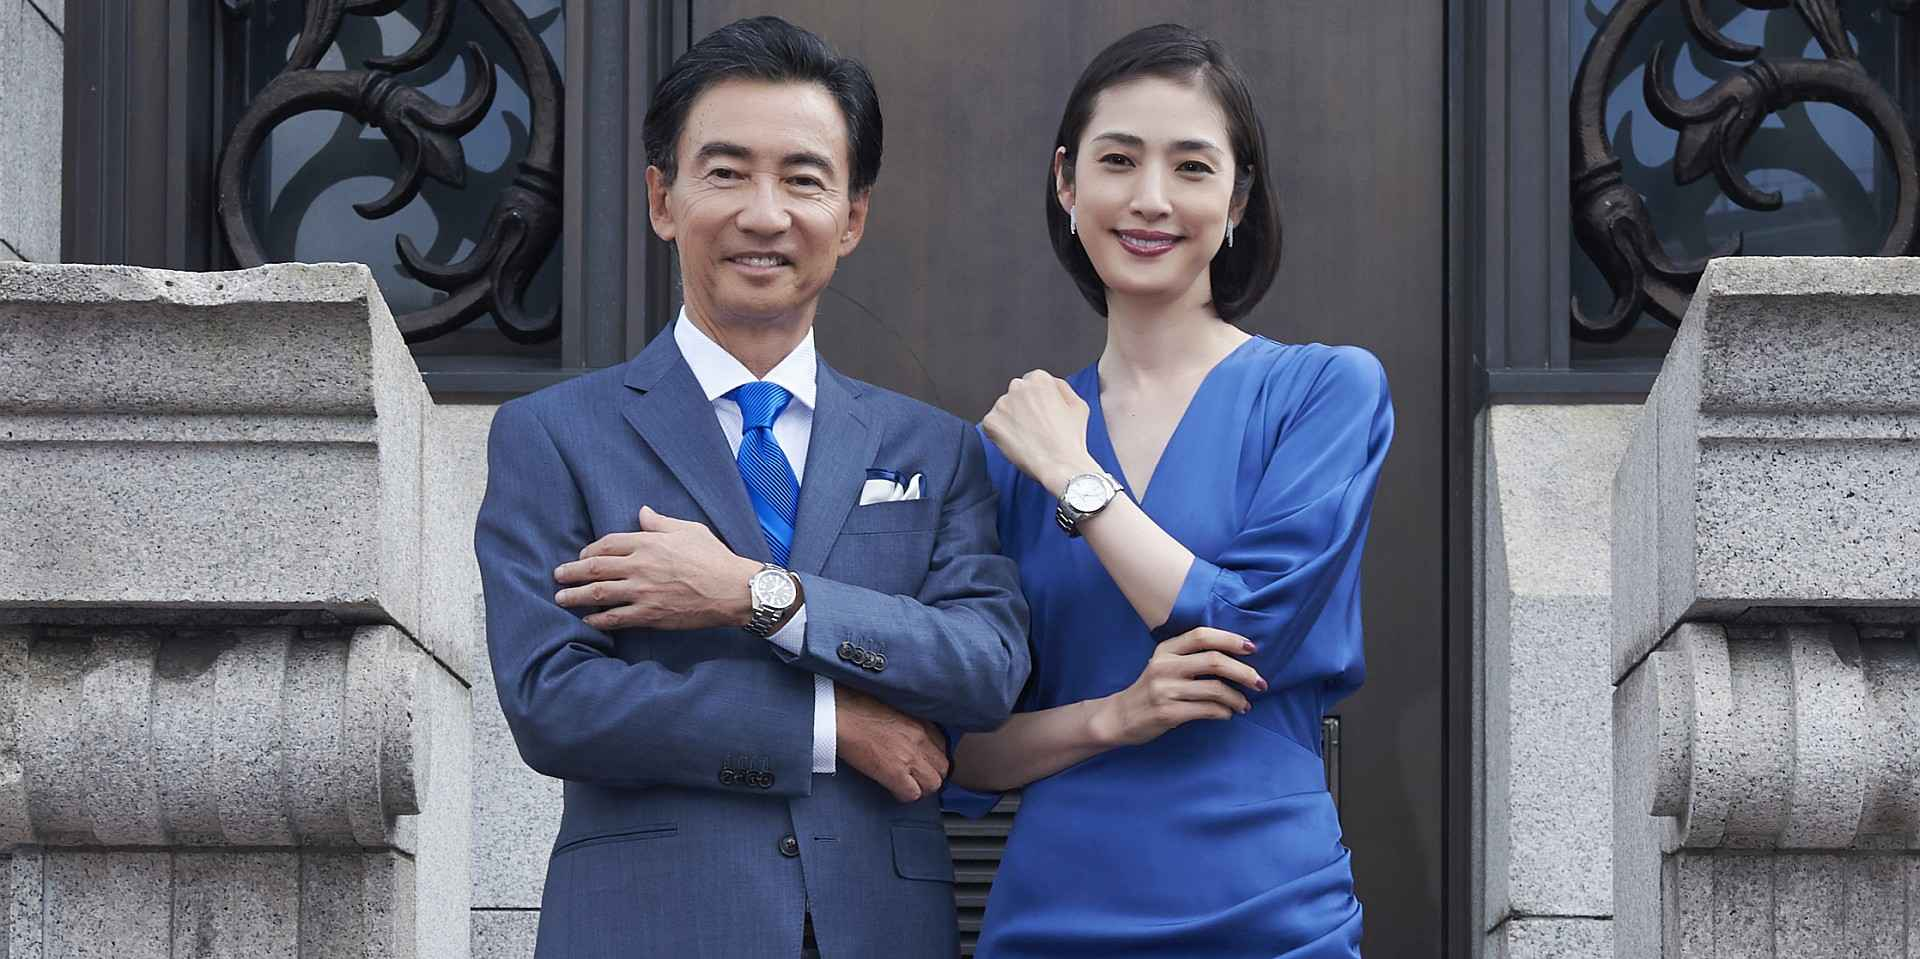 完美體現「THE NATURE OF TIME」品牌精神,Grand Seiko宣布天海祐希擔任亞洲區代言人